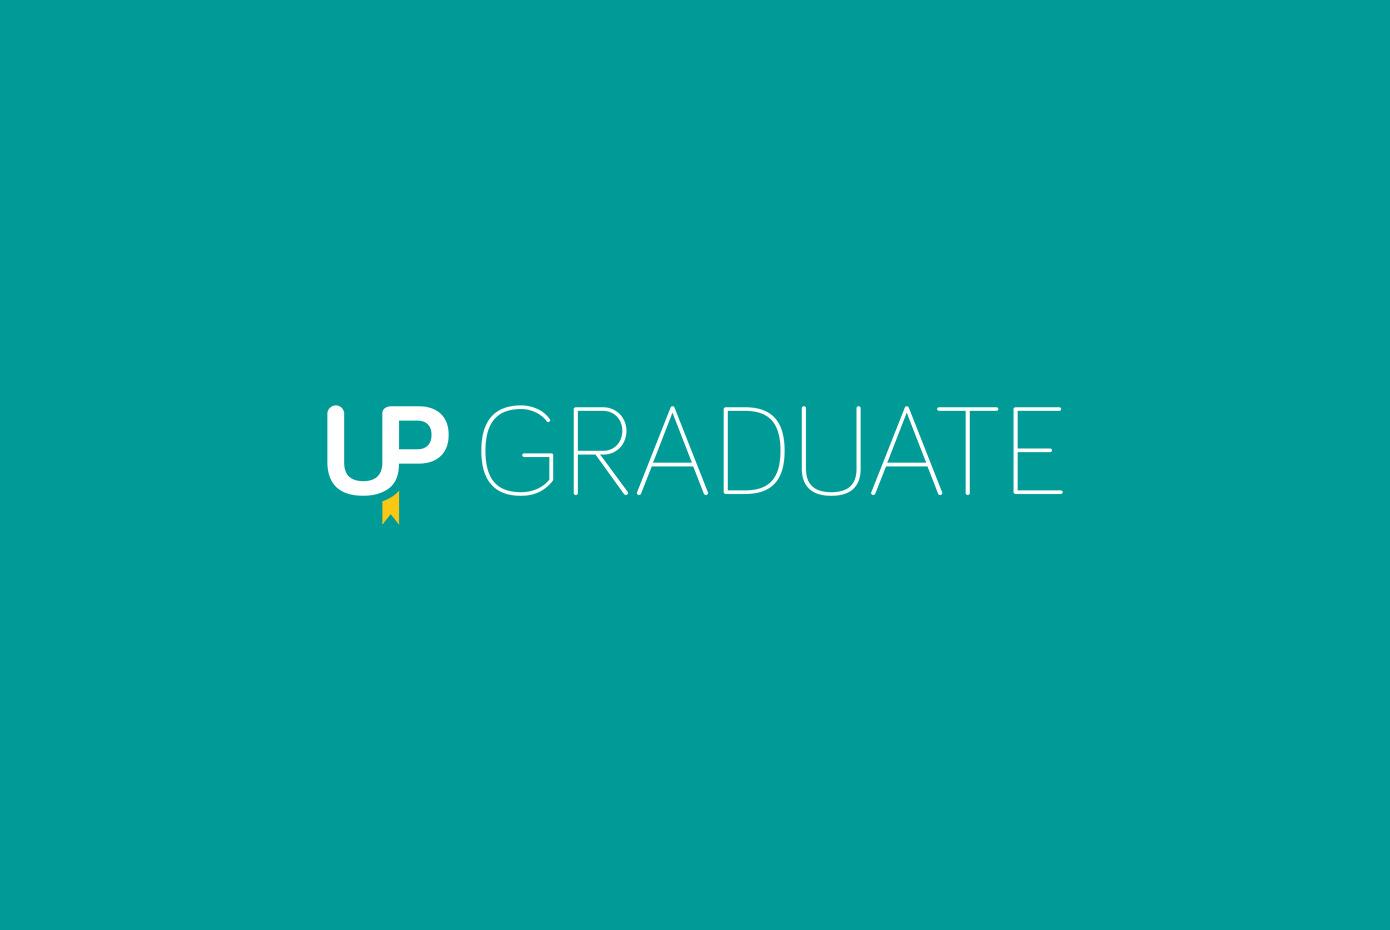 Logo UP Graduate